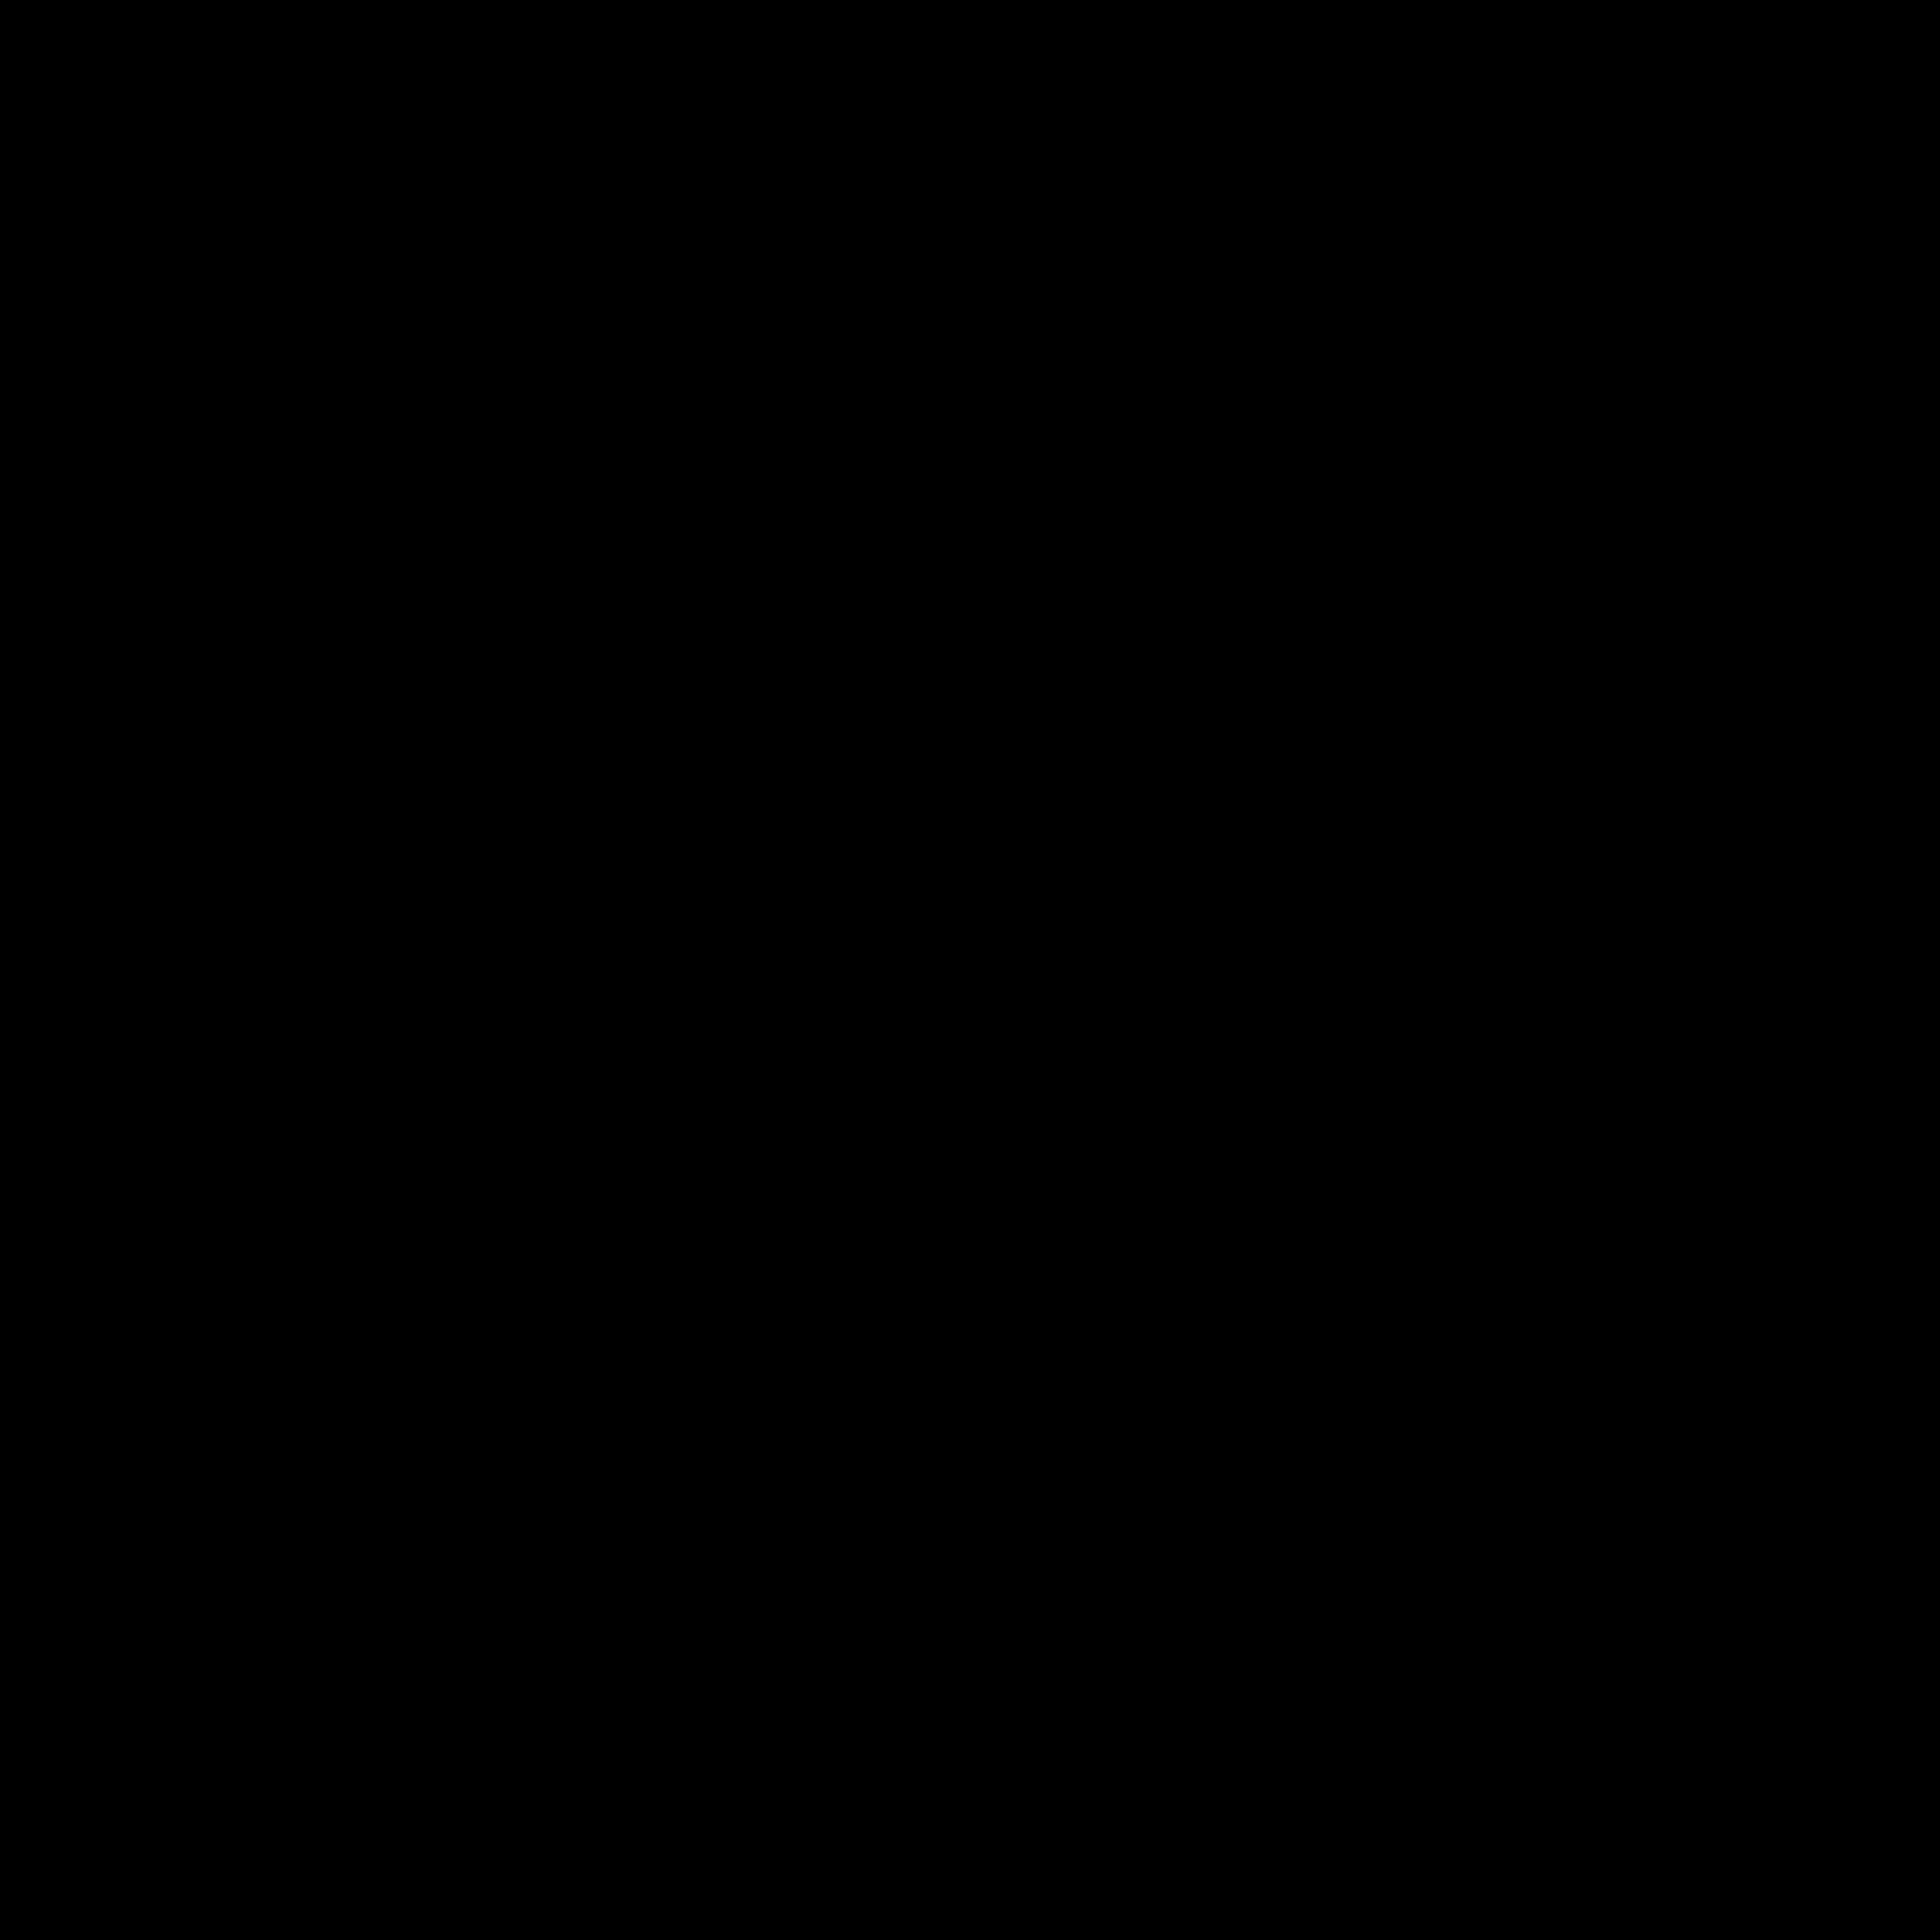 audi-14-logo-png-transparent.png